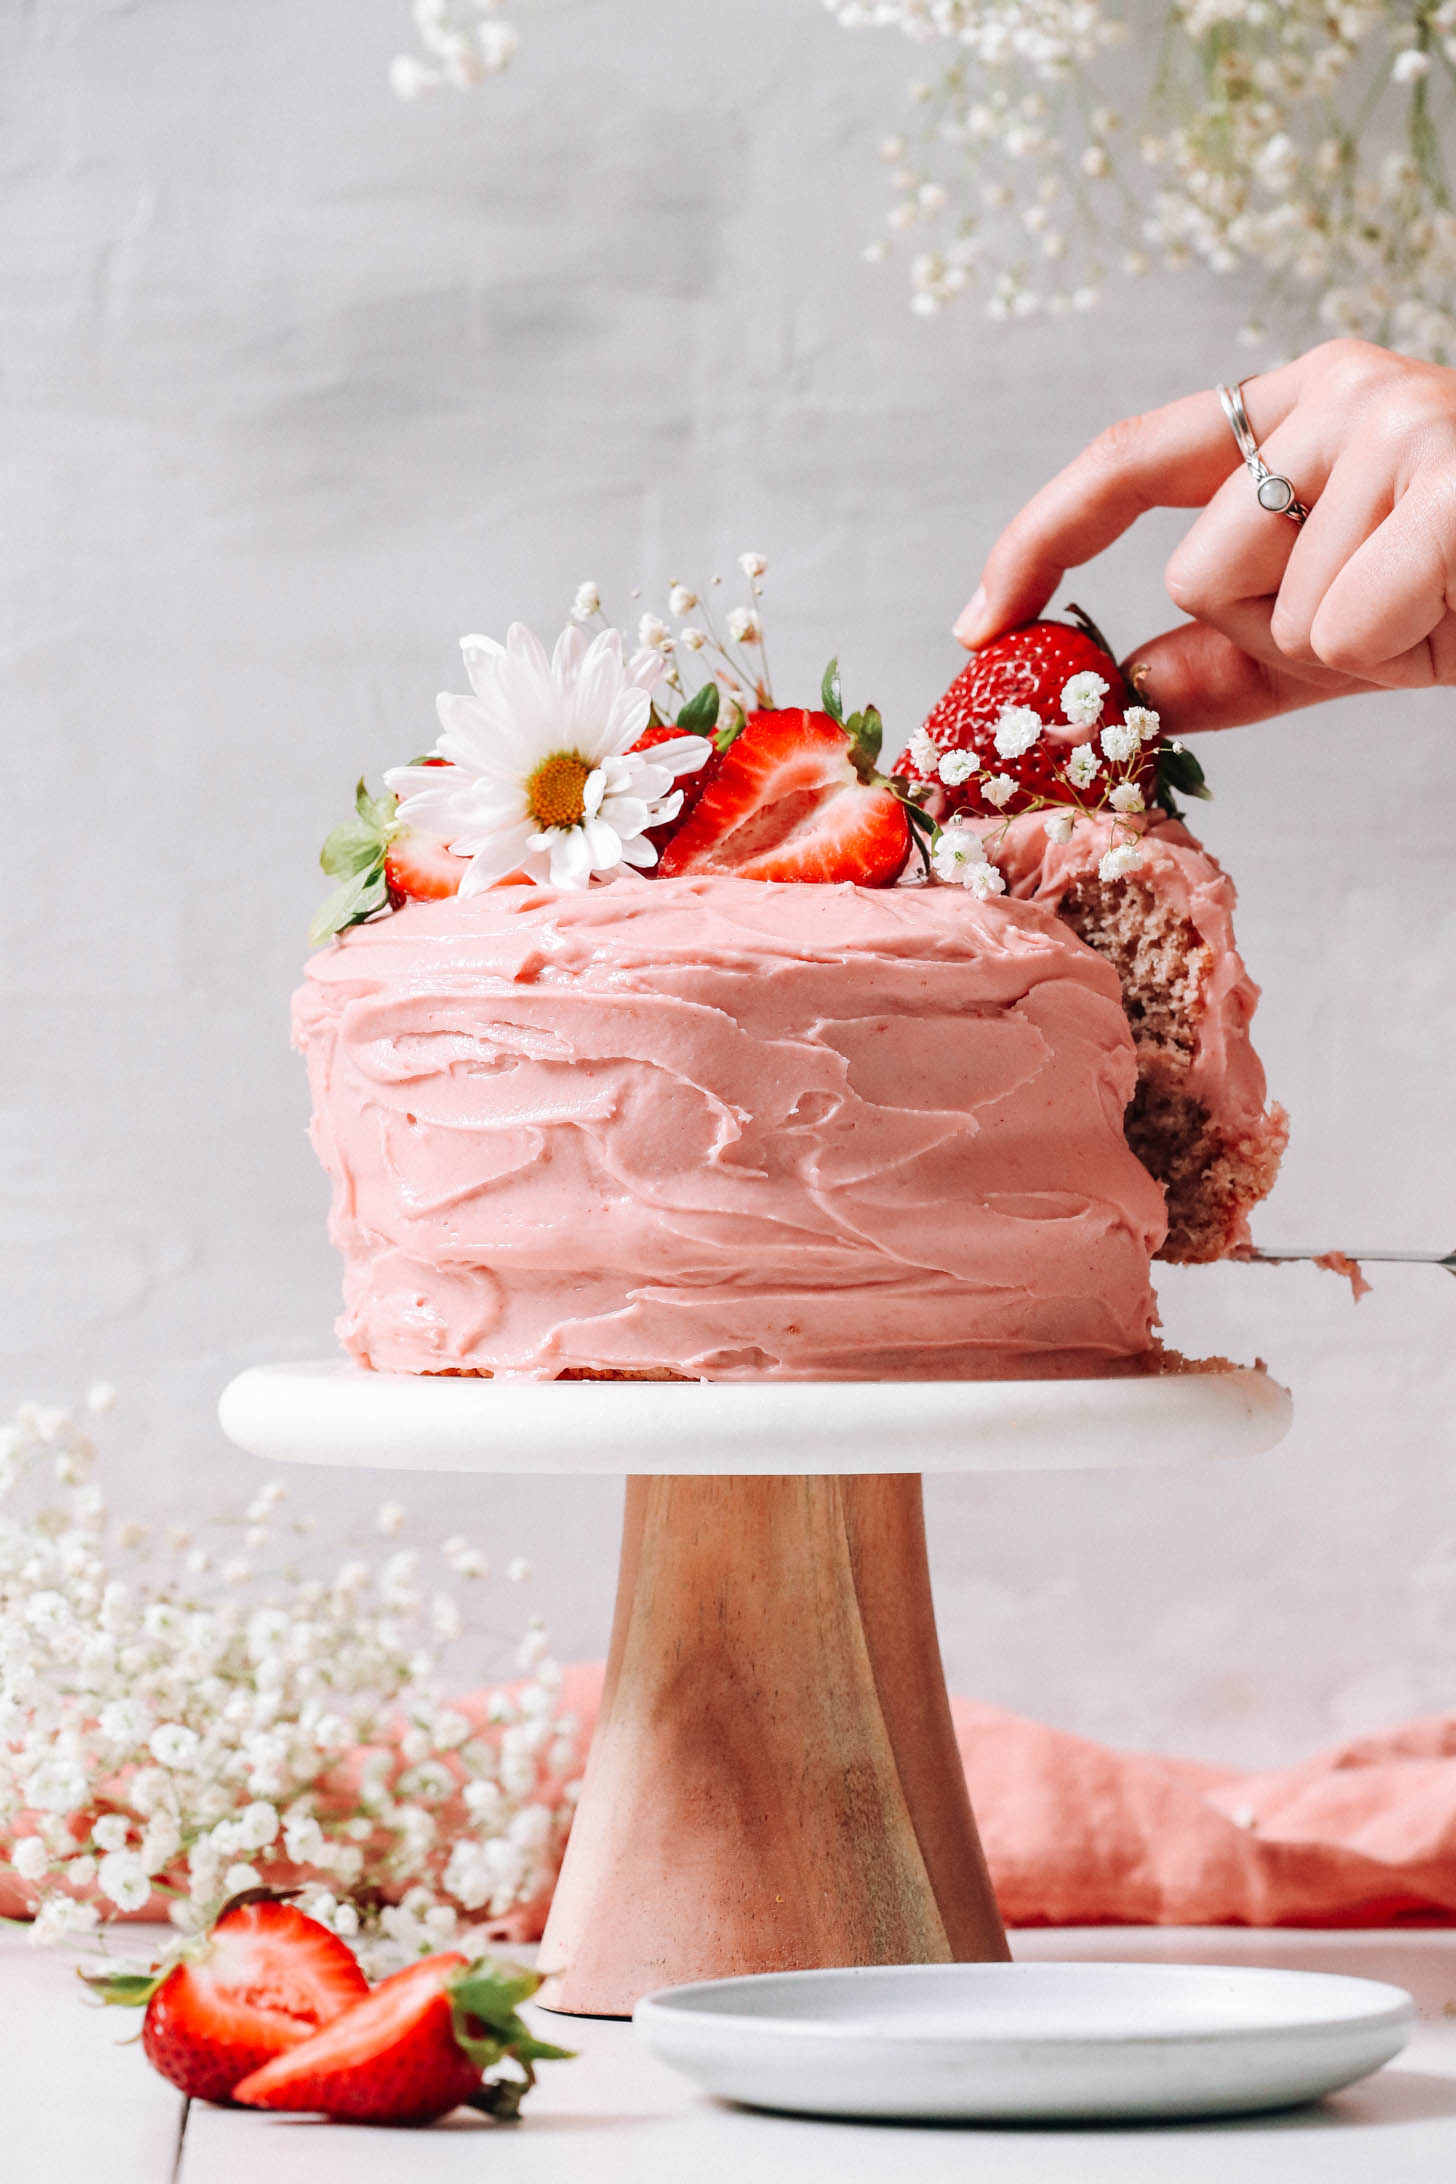 Gluten-free vegan strawberry cake decorated with fresh strawberries and flowers